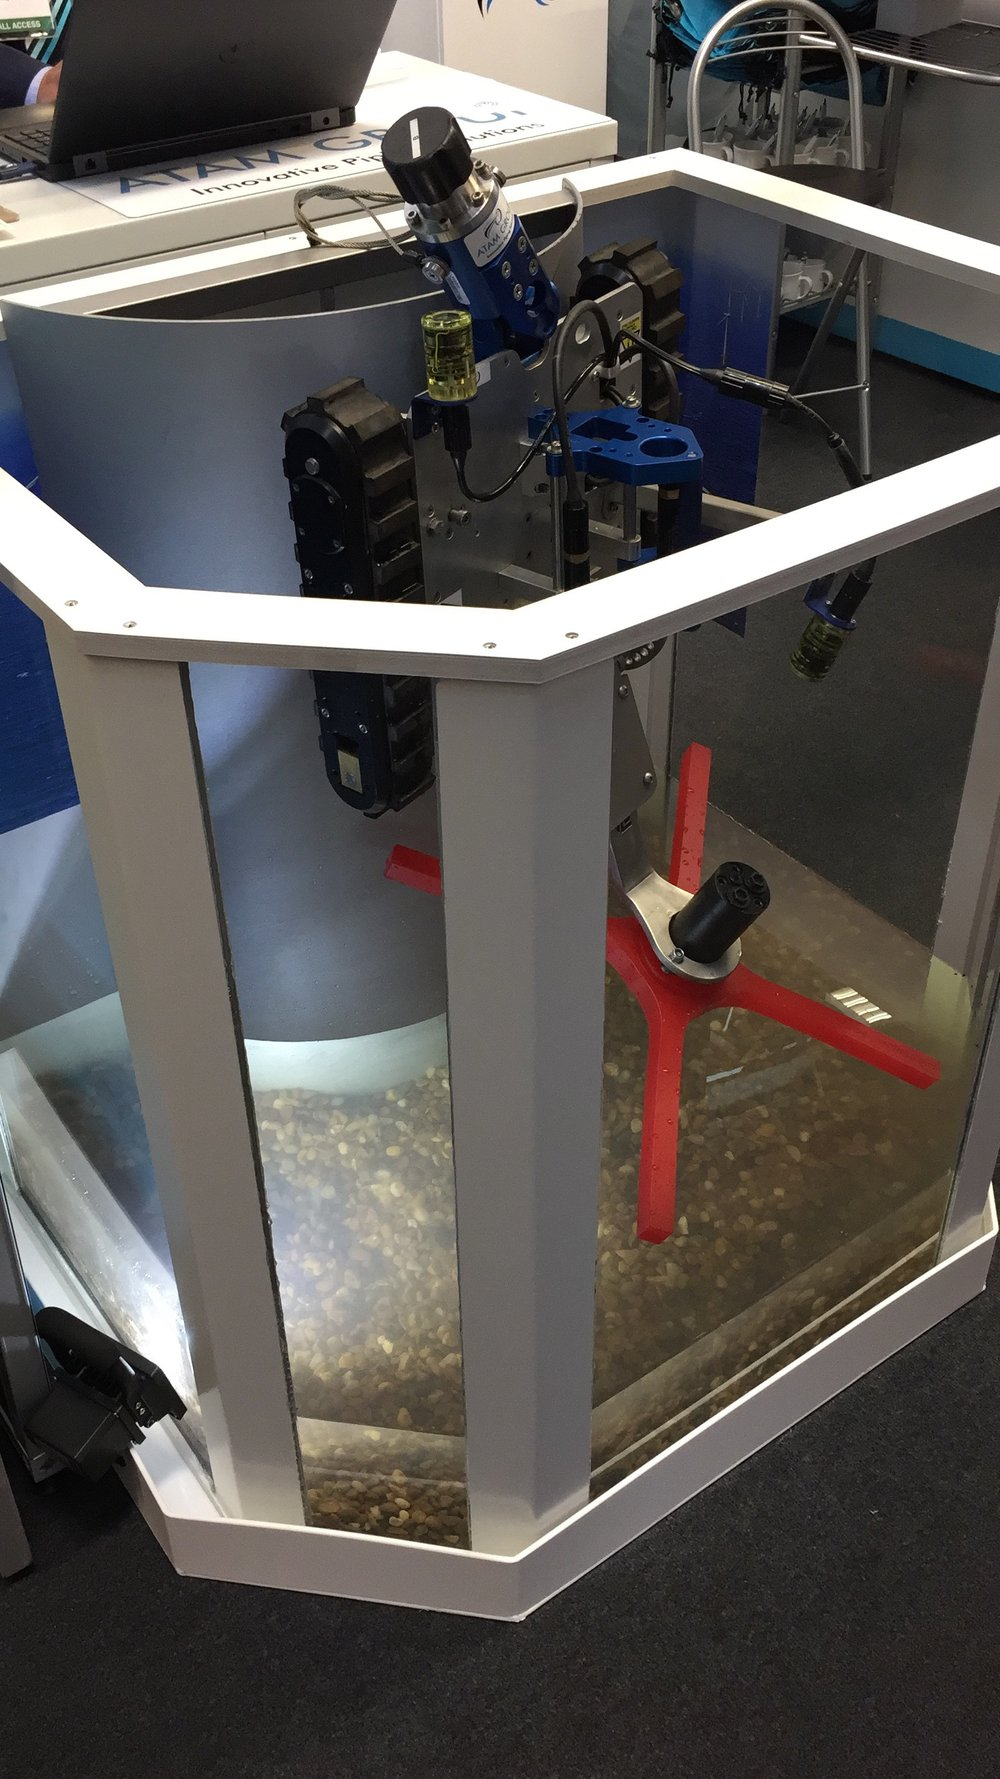 IM3 technology on display